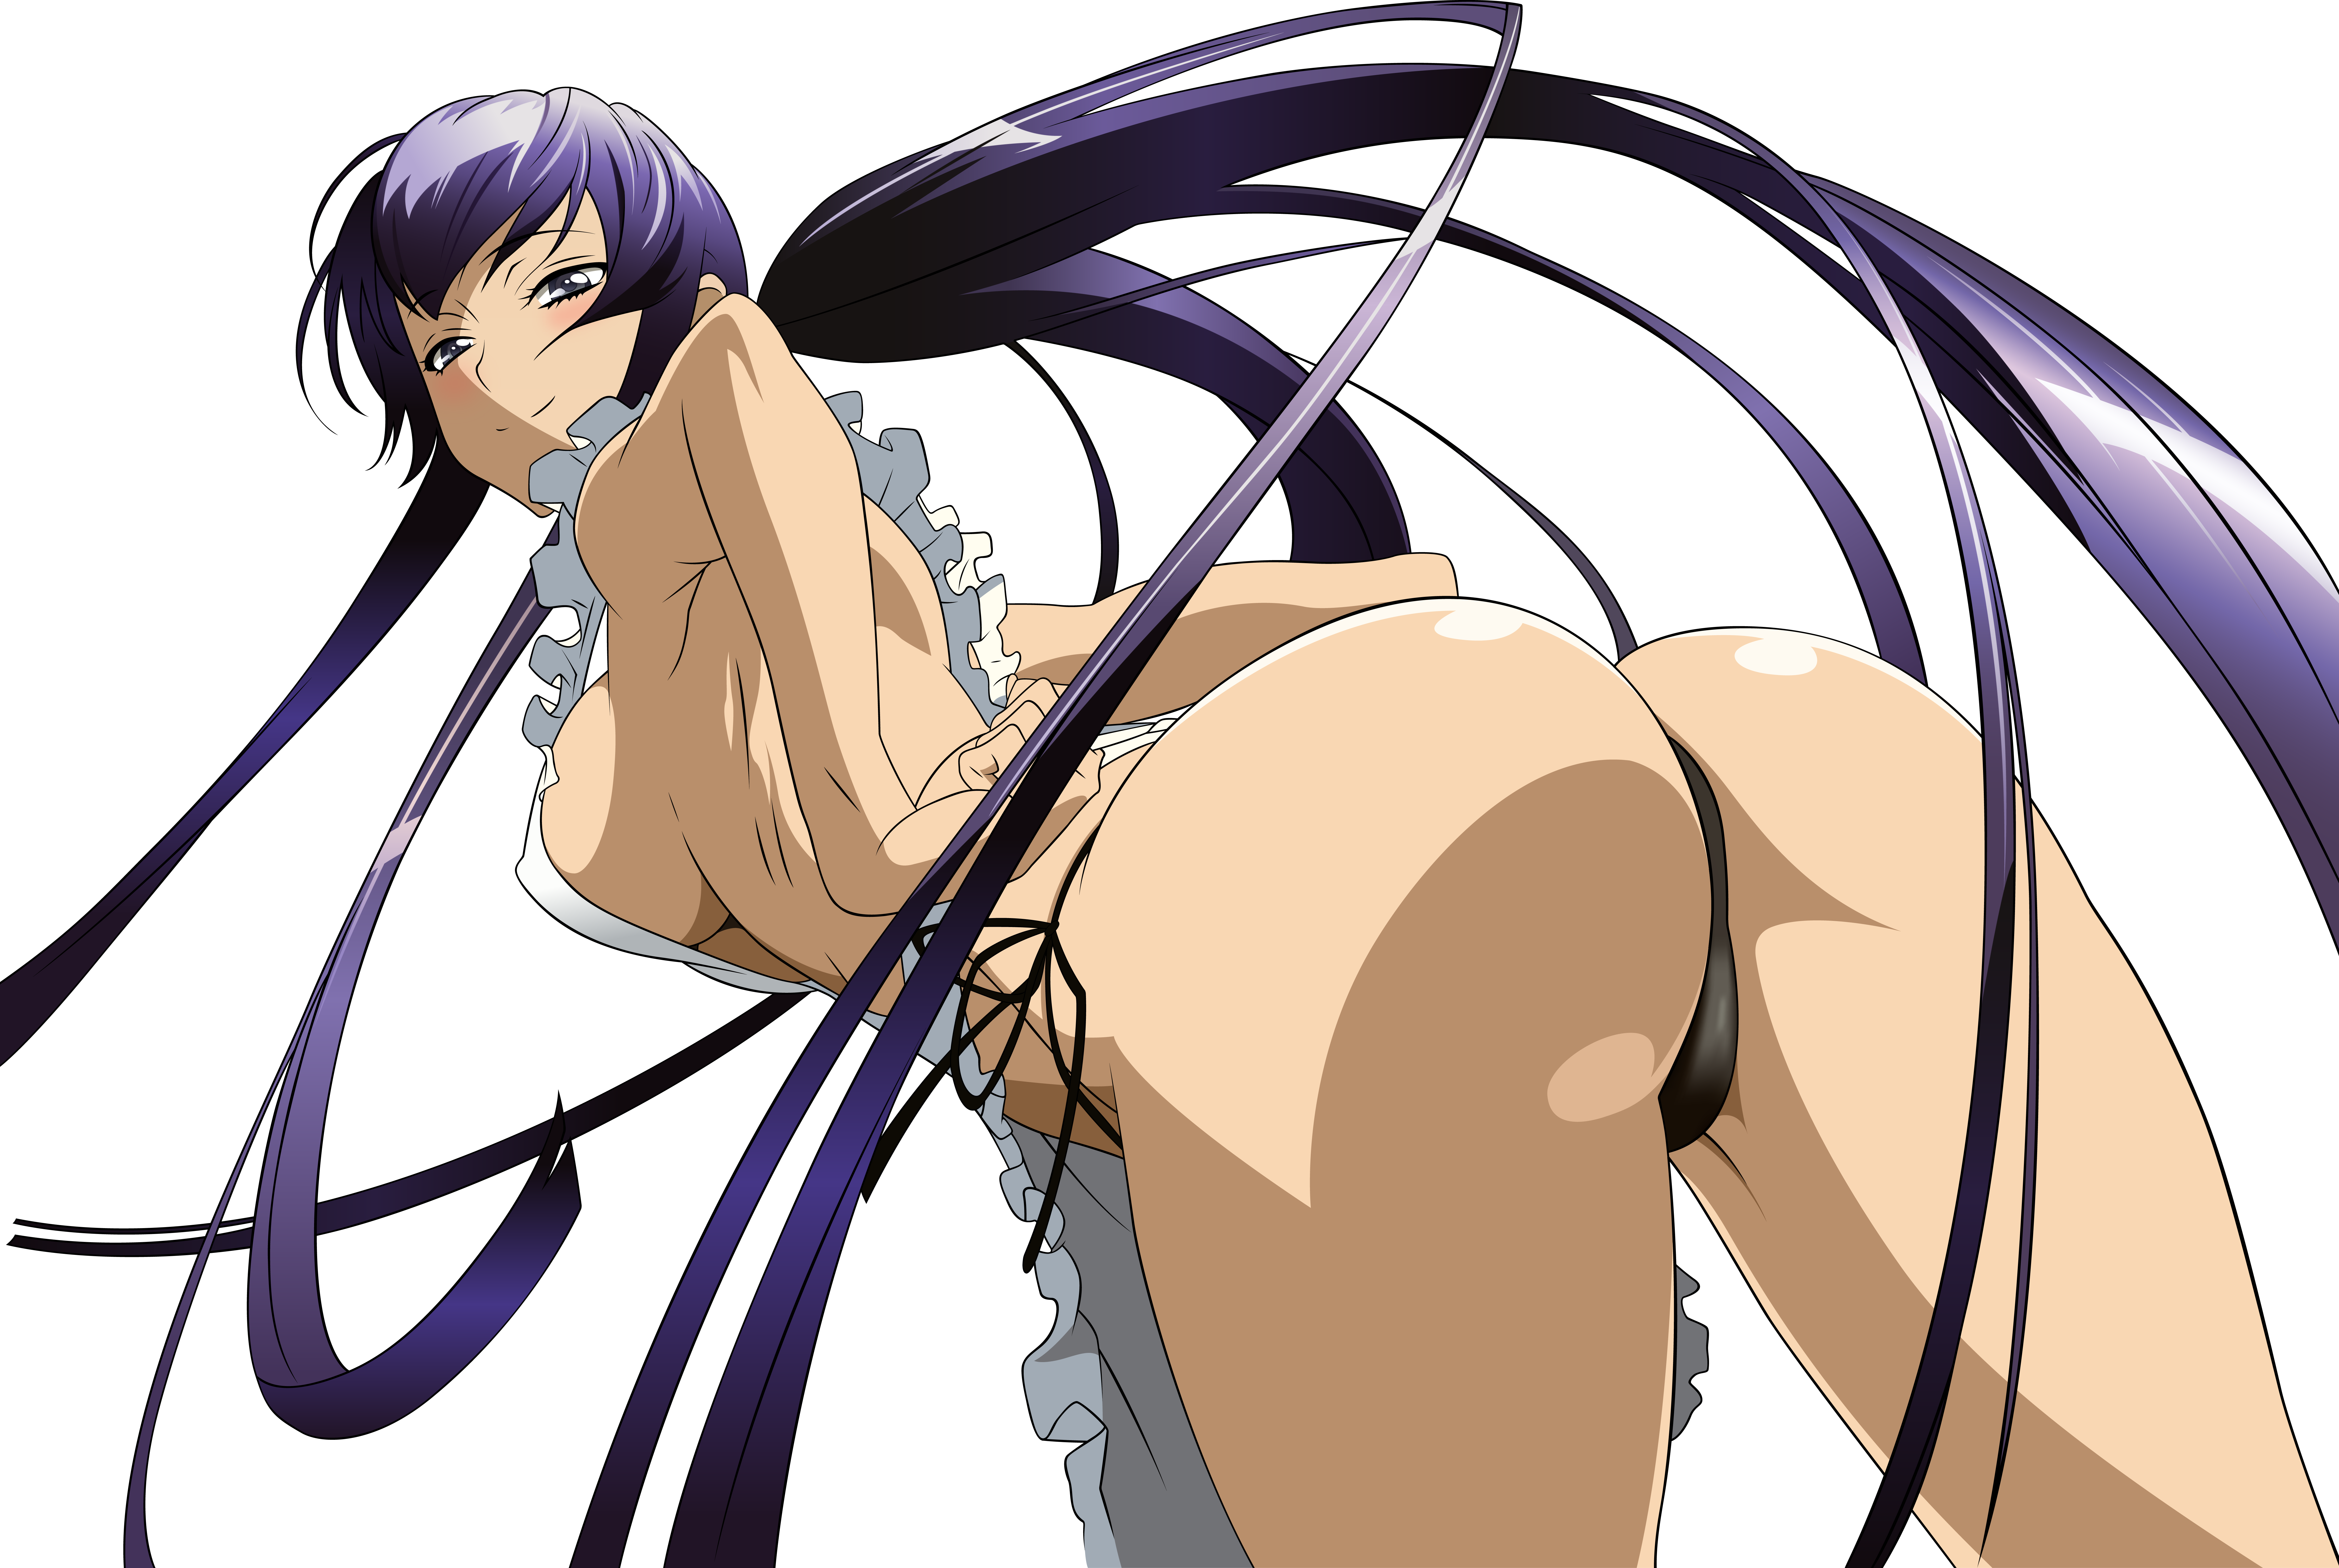 Anime 9167x6145 boobs anime girls anime ass big boobs panties long hair purple hair DeviantArt rear view simple background black background smiling